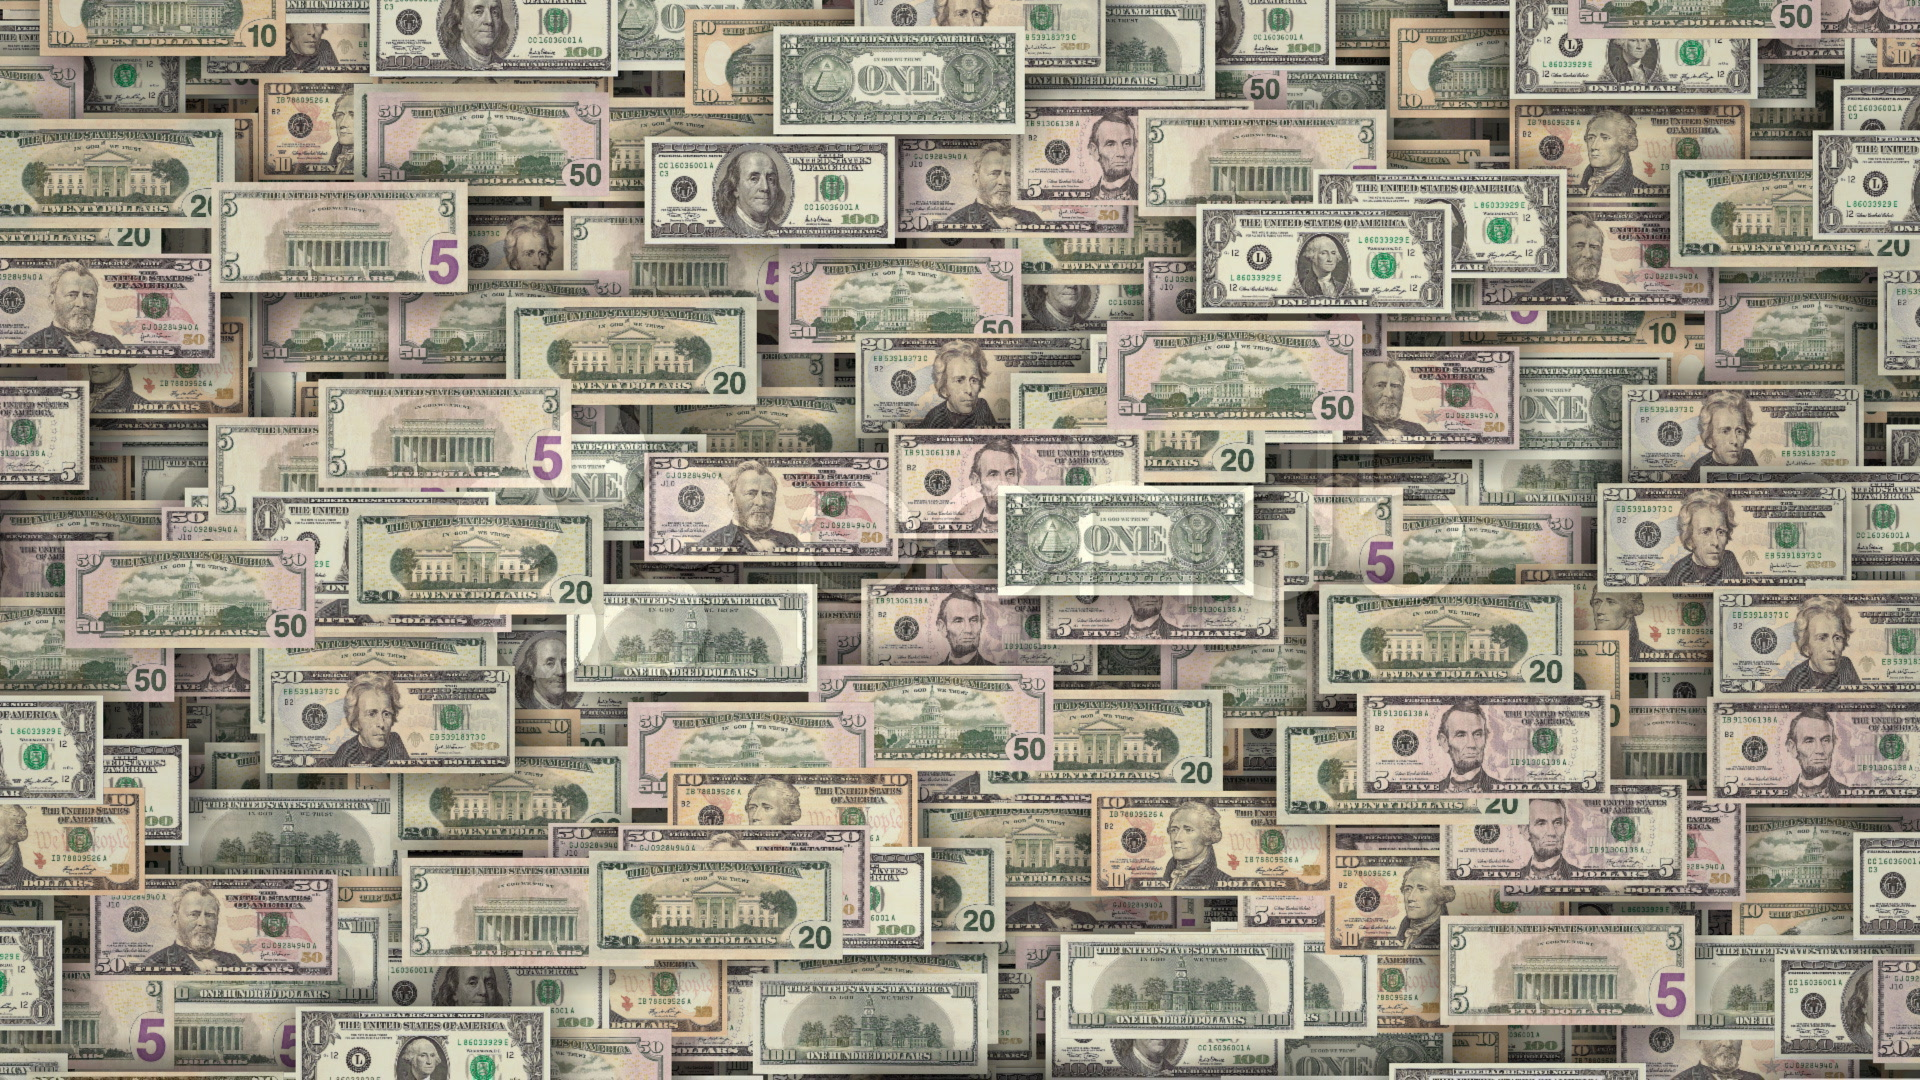 Free Download Stacks Of Money Wallpaper View Full Frame